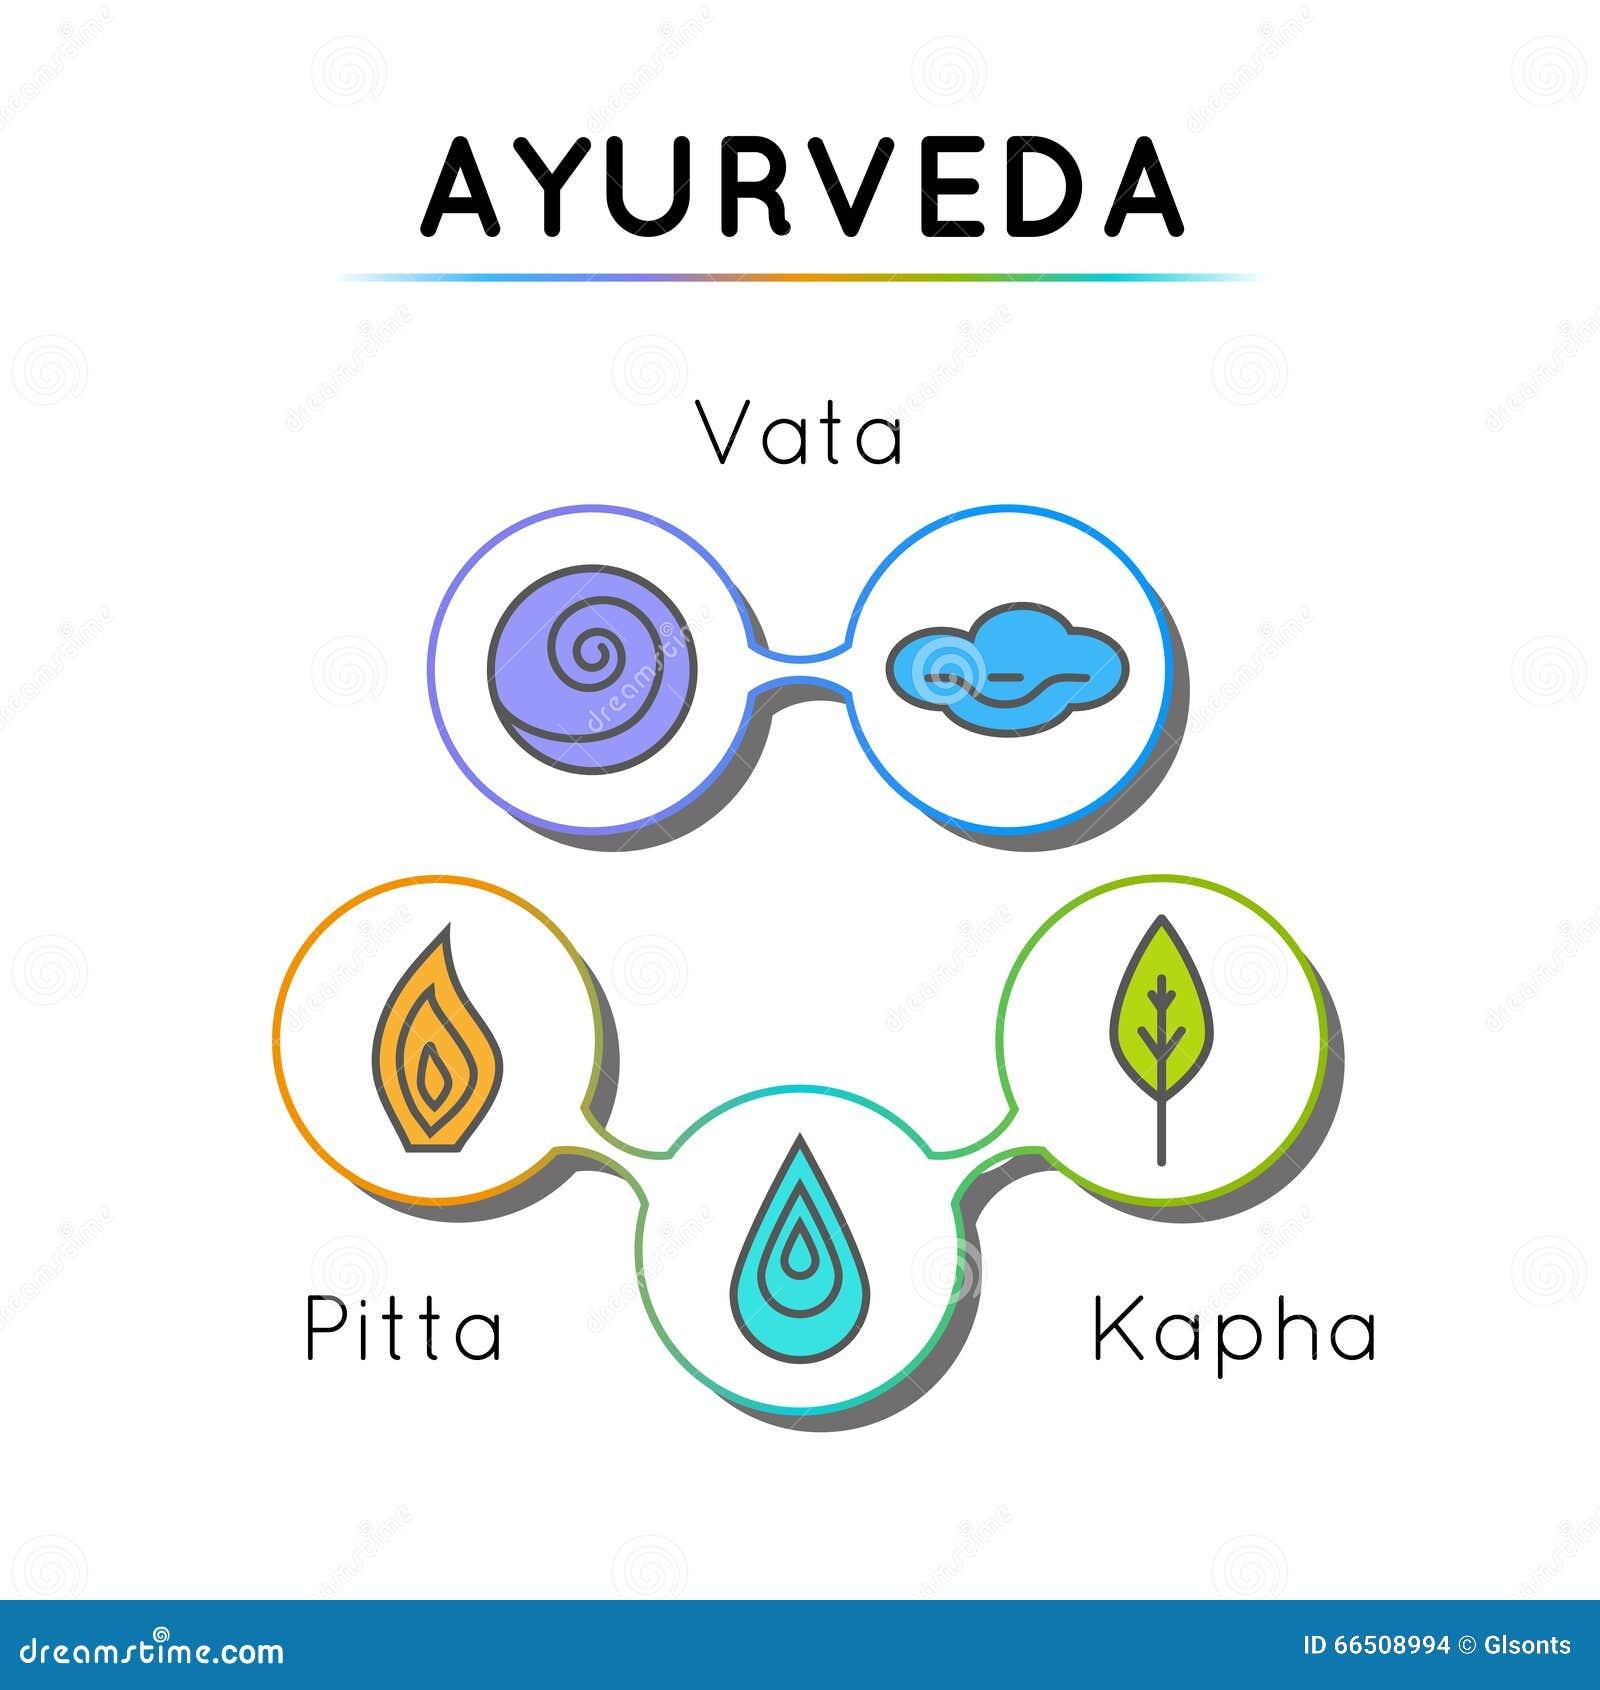 types of ayurvedic medicine